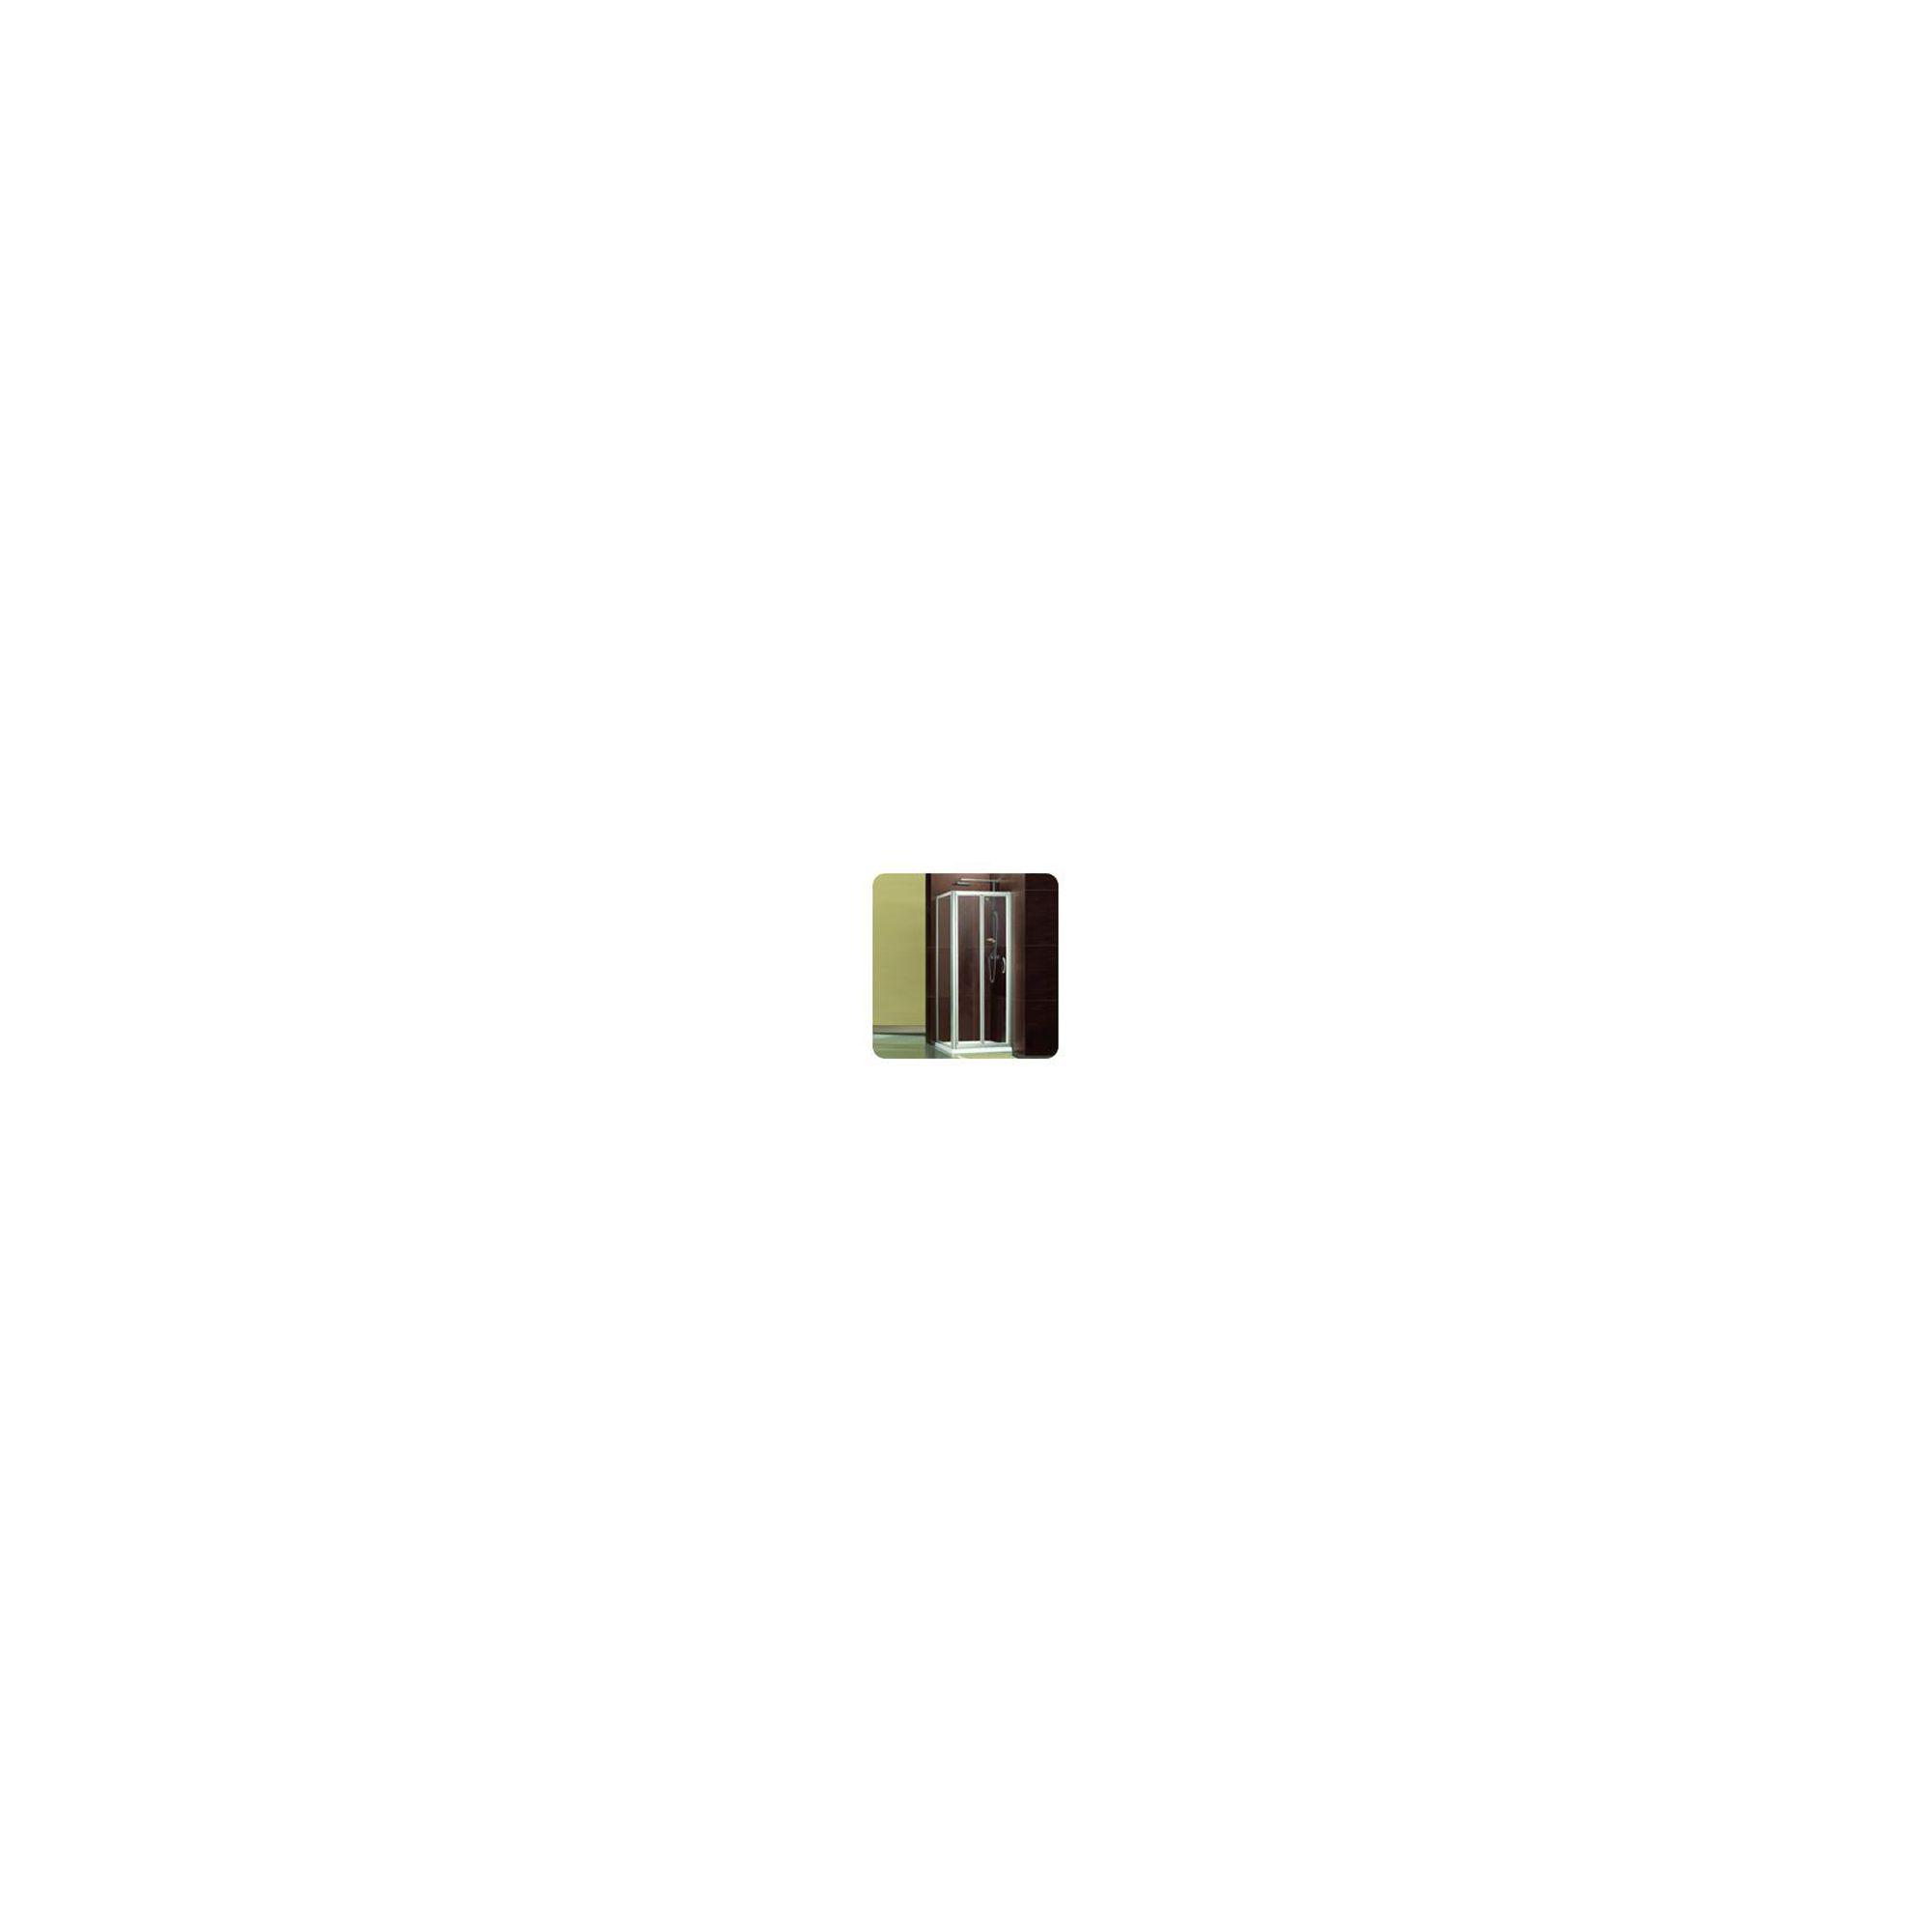 Balterley Framed Bi-Fold Shower Enclosure, 900mm x 900mm, Standard Tray, 6mm Glass at Tesco Direct